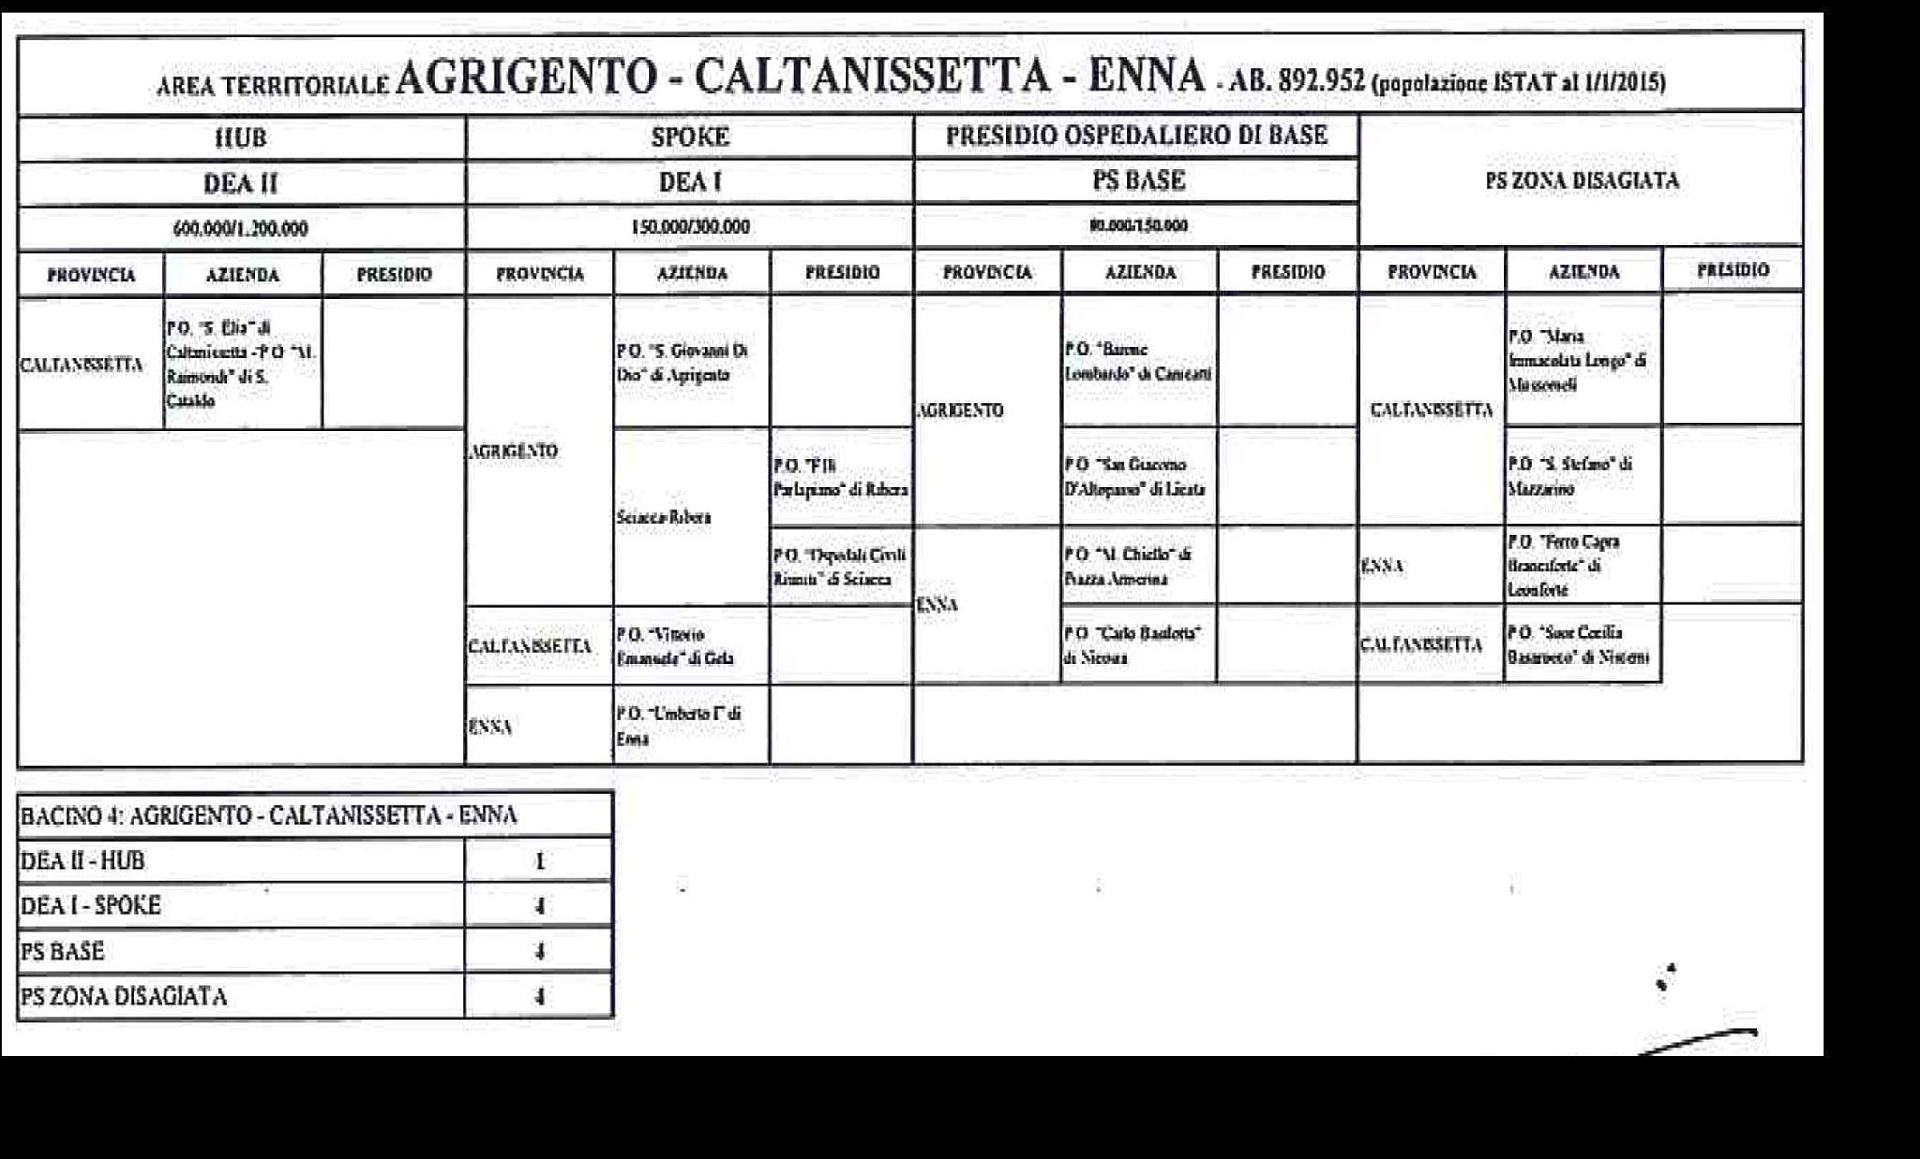 Bacino Agrigento- Caltanissetta- Enna (segue)